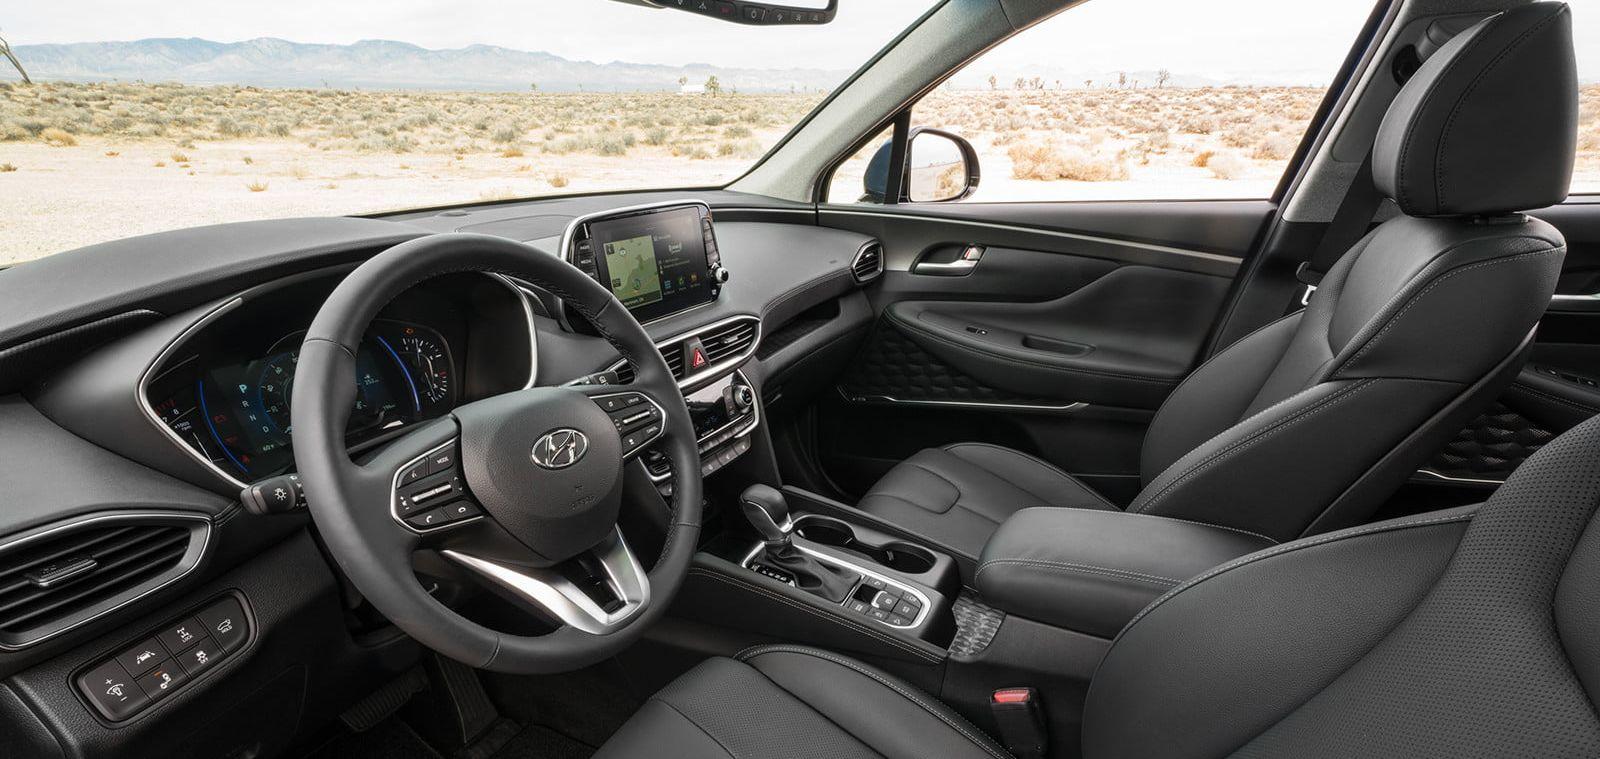 2019 Hyundai Santa Fe Center Console